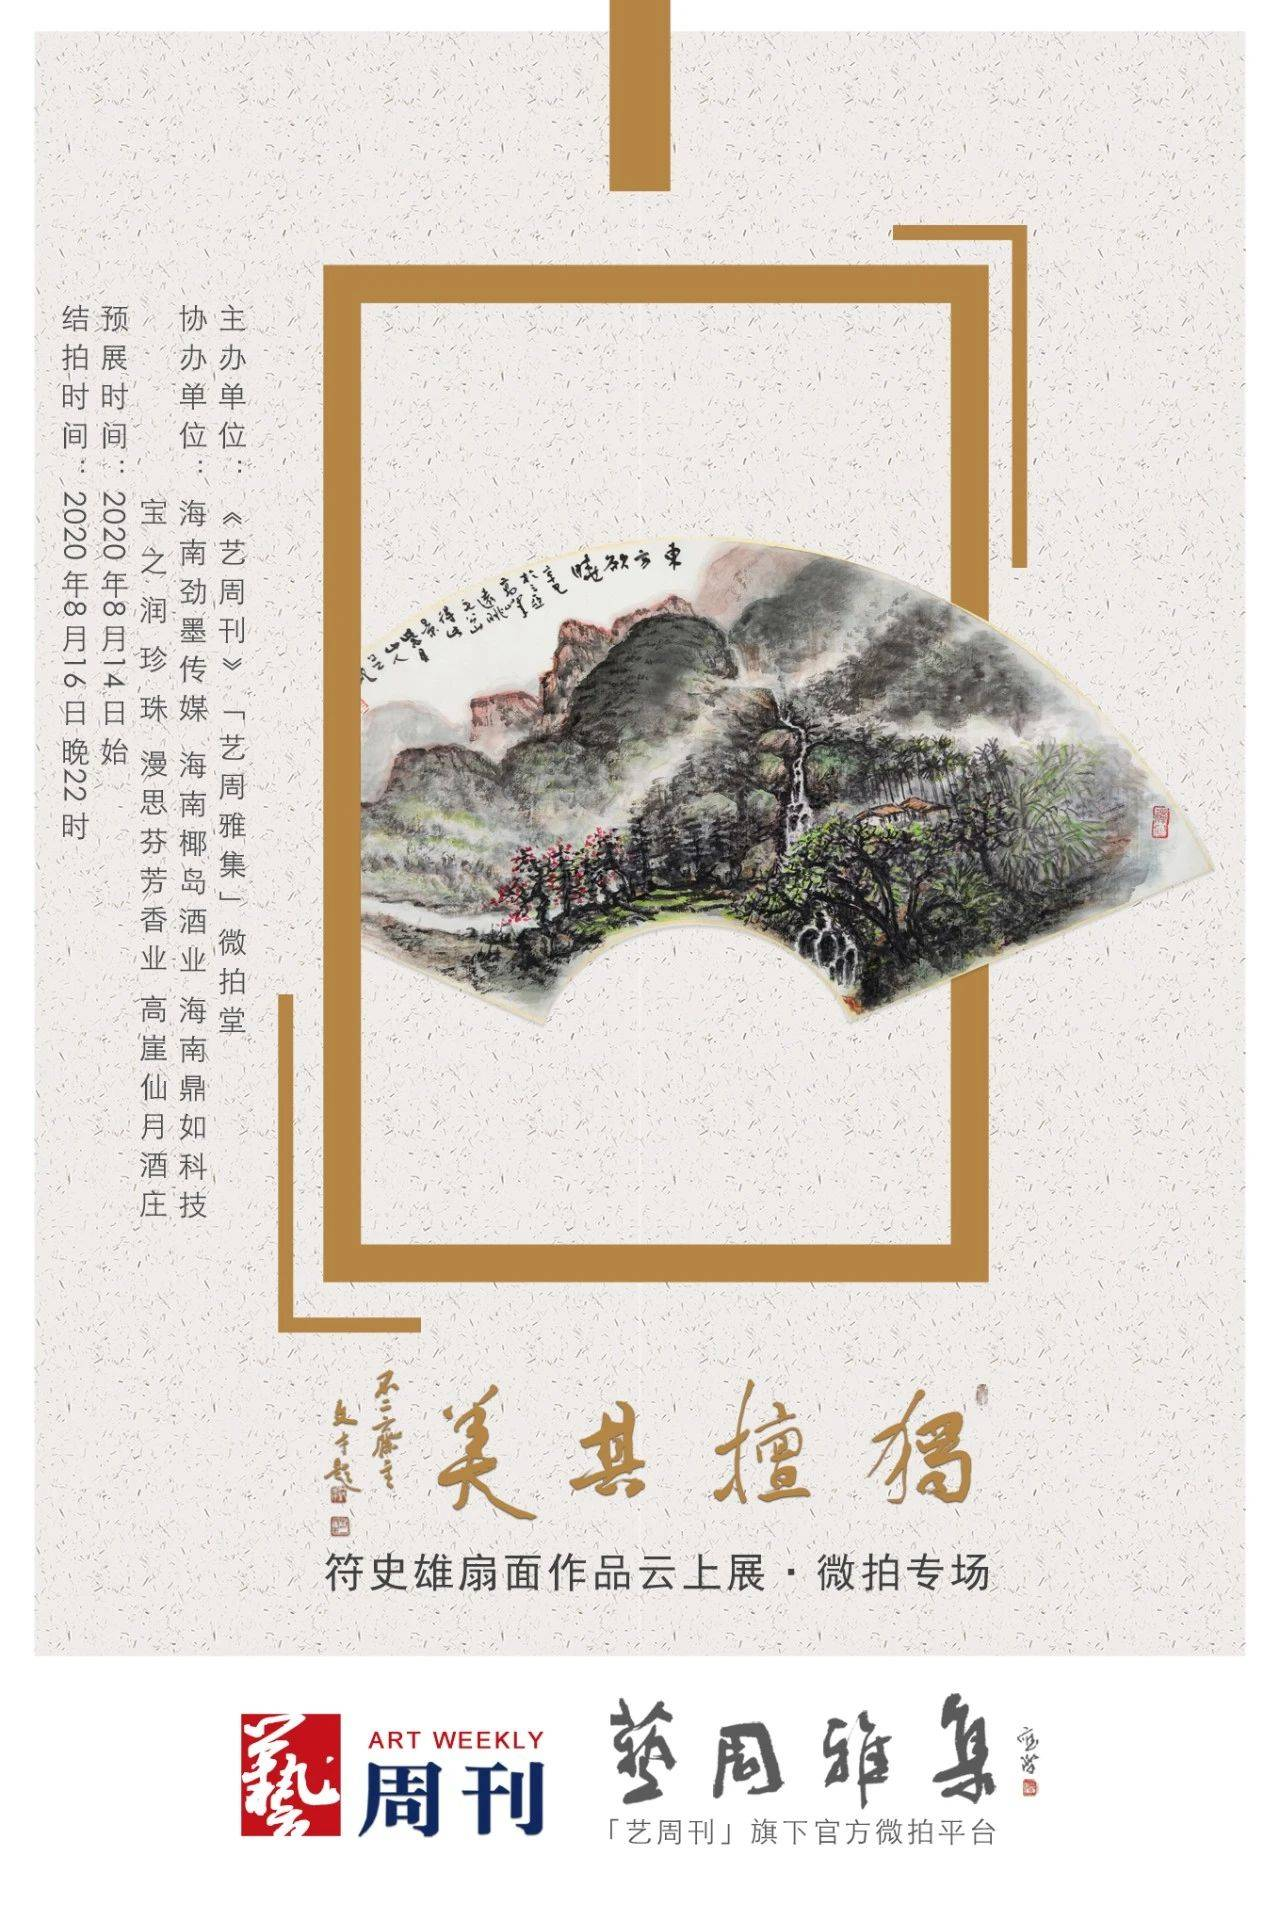 http://www.k2summit.cn/shumashebei/2862616.html